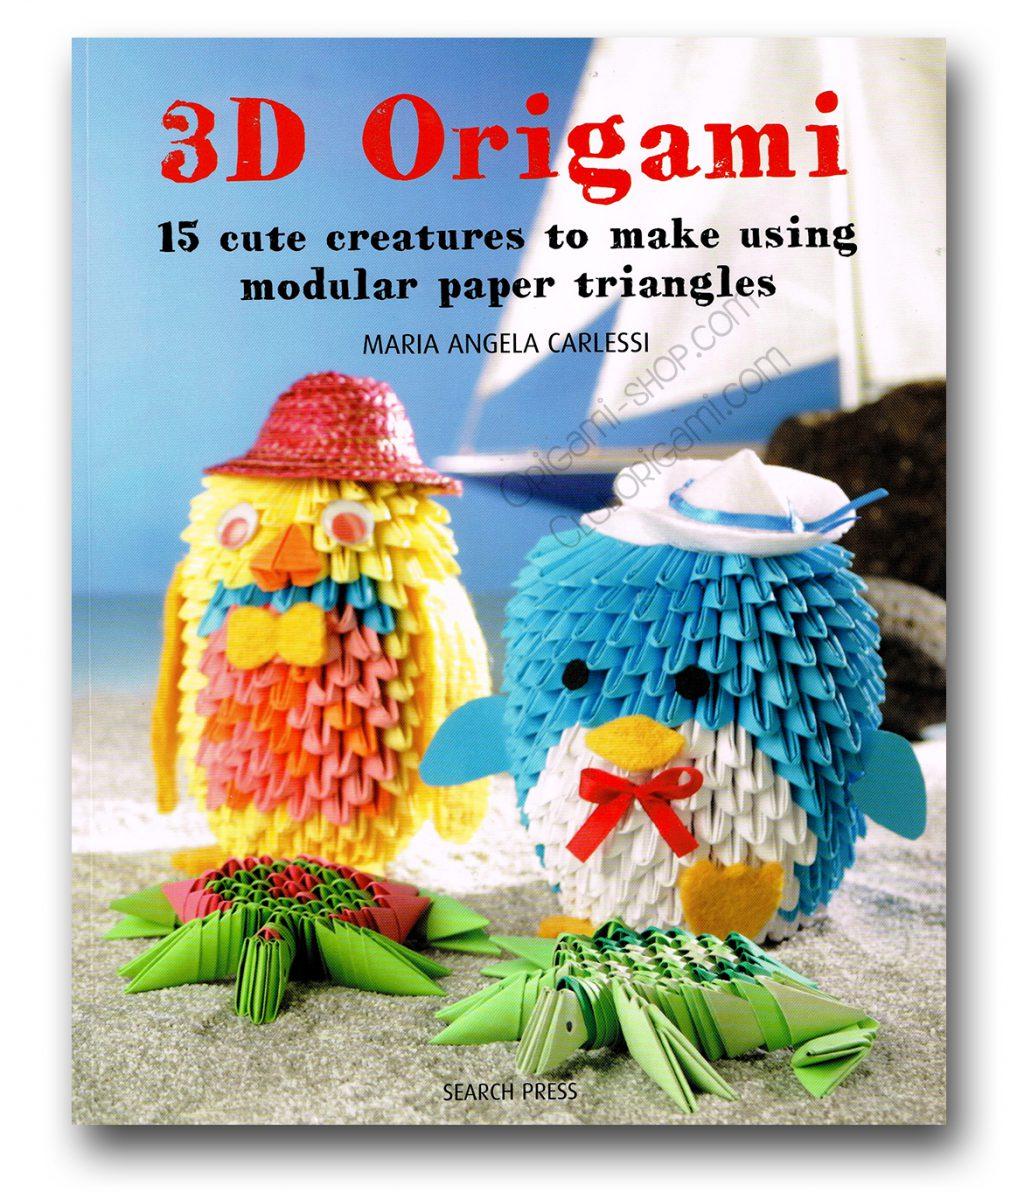 3d origami 15 cutes creatures to make 3d origami by ikuko okada jeuxipadfo Gallery